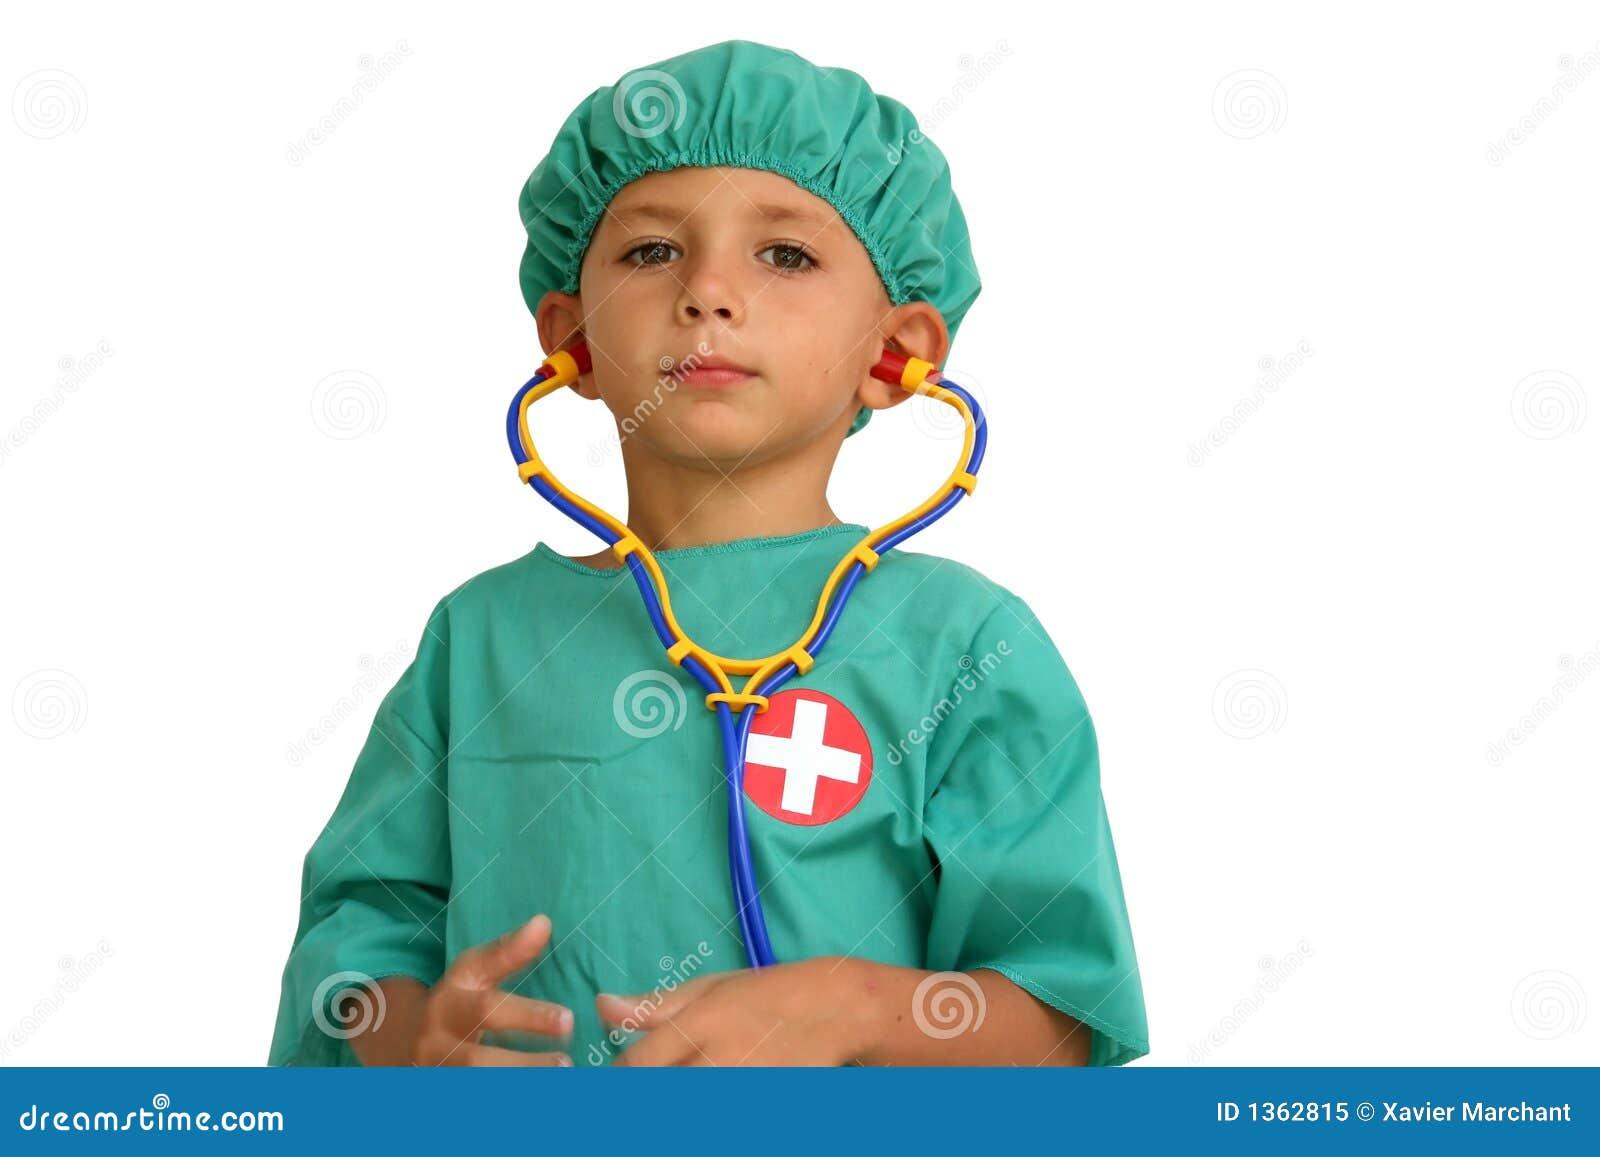 doctor kid